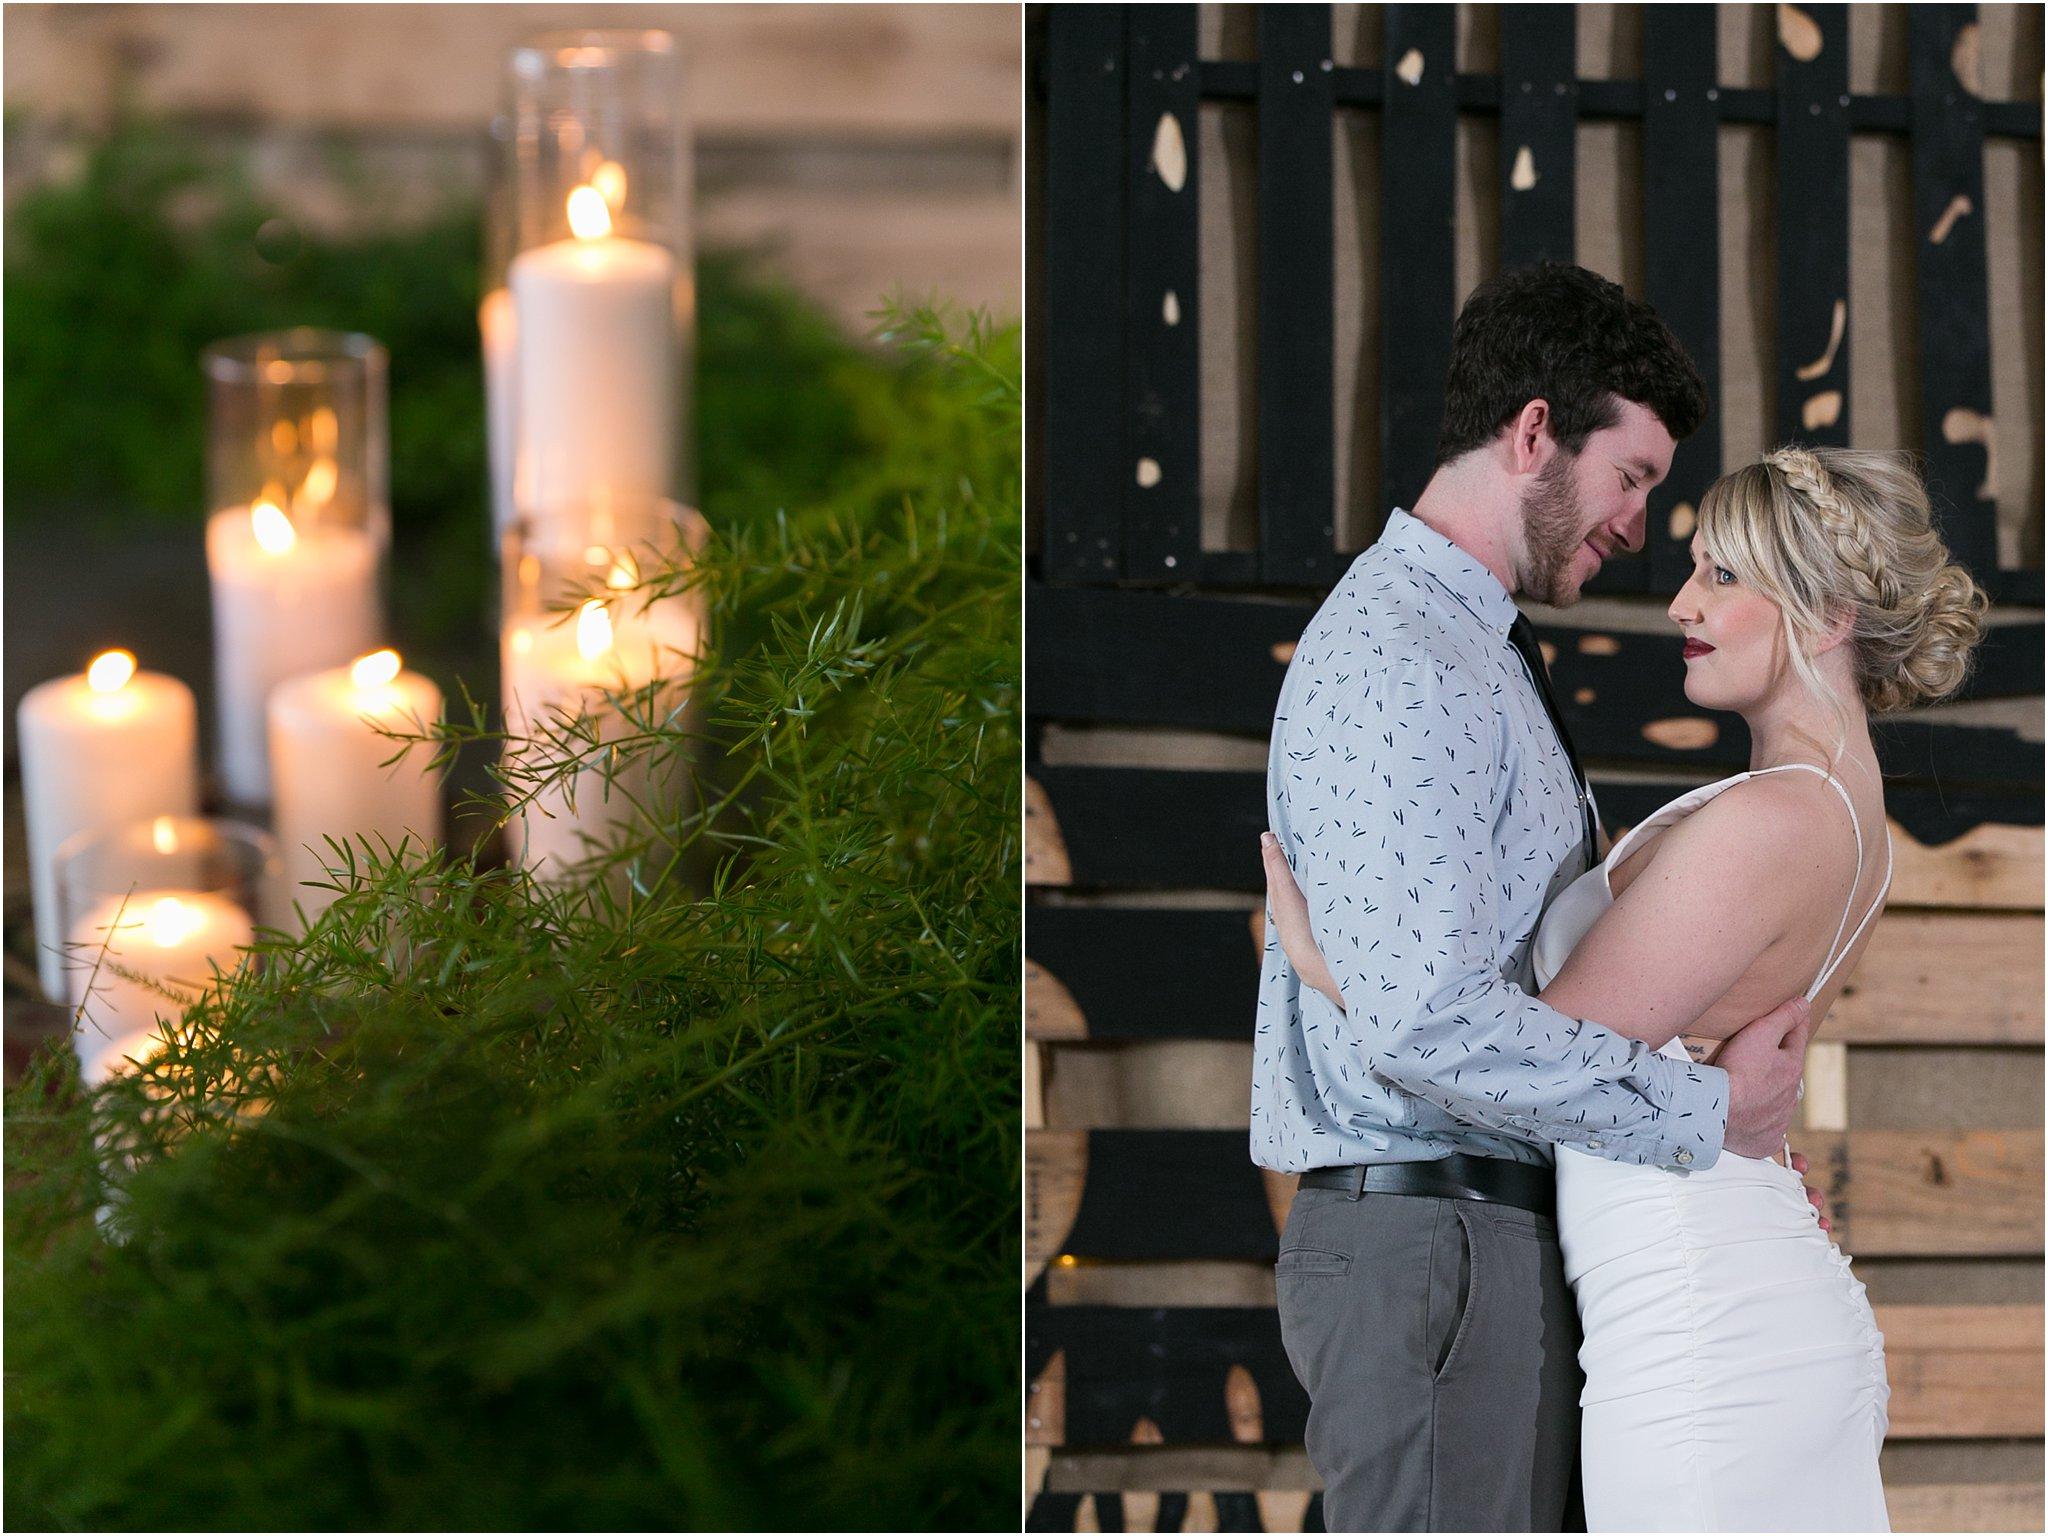 jessica_ryan_photography_oconnor_brewing_wedding_oconnor_brewing_co_norfolk_virginia_roost_flowers_blue_birds_garage__0784